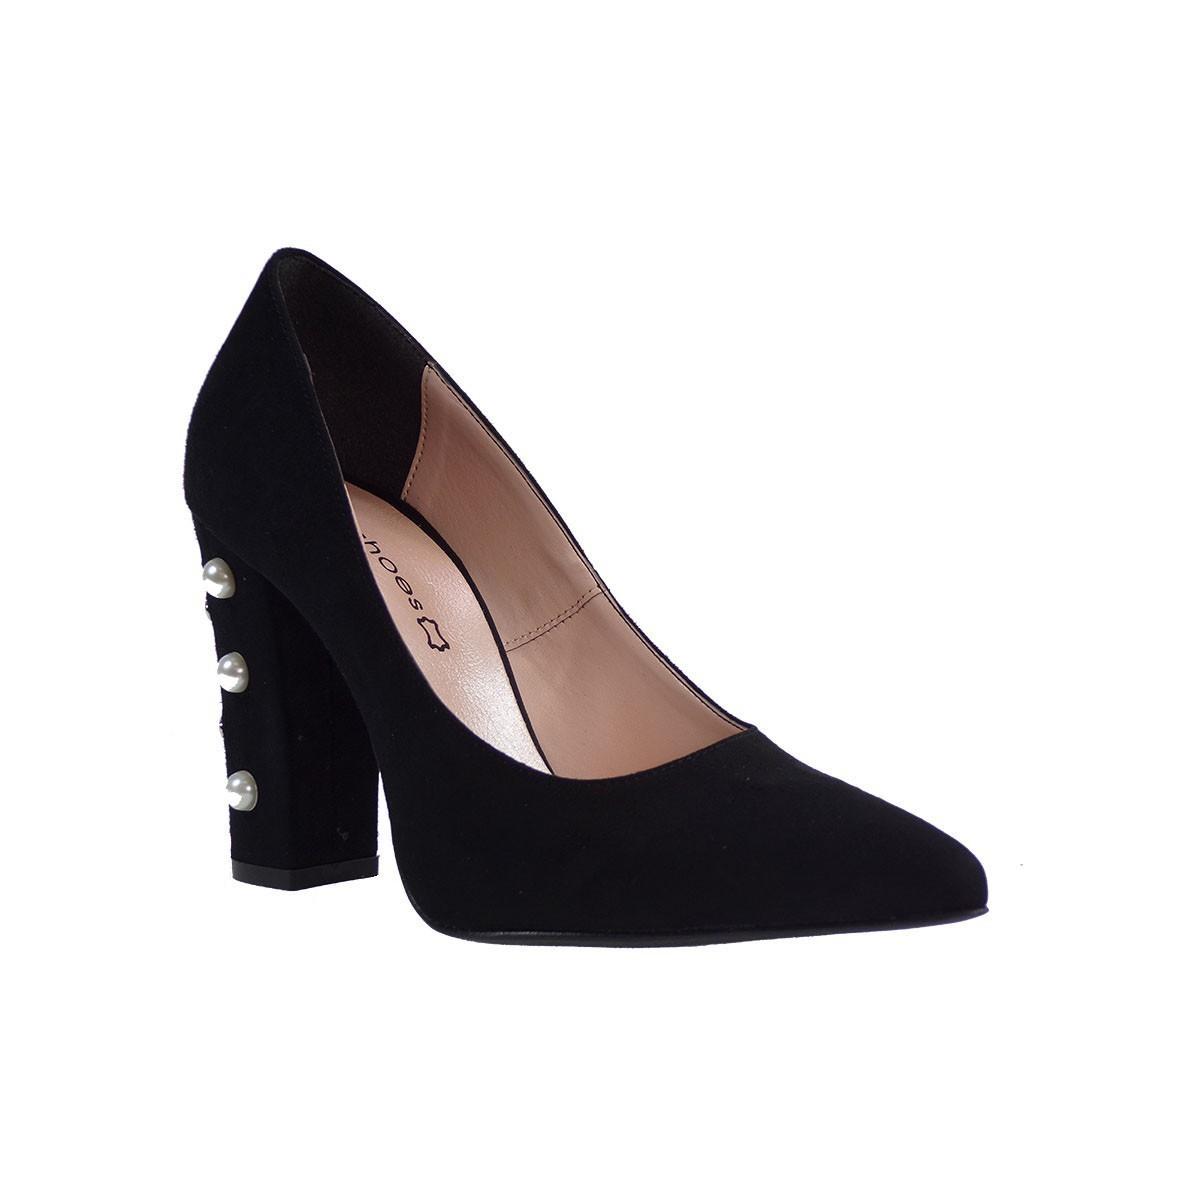 KATIA SHOES Γυναικεία Παπούτσια Γόβες 146/4972 Μαύρο Καστόρι